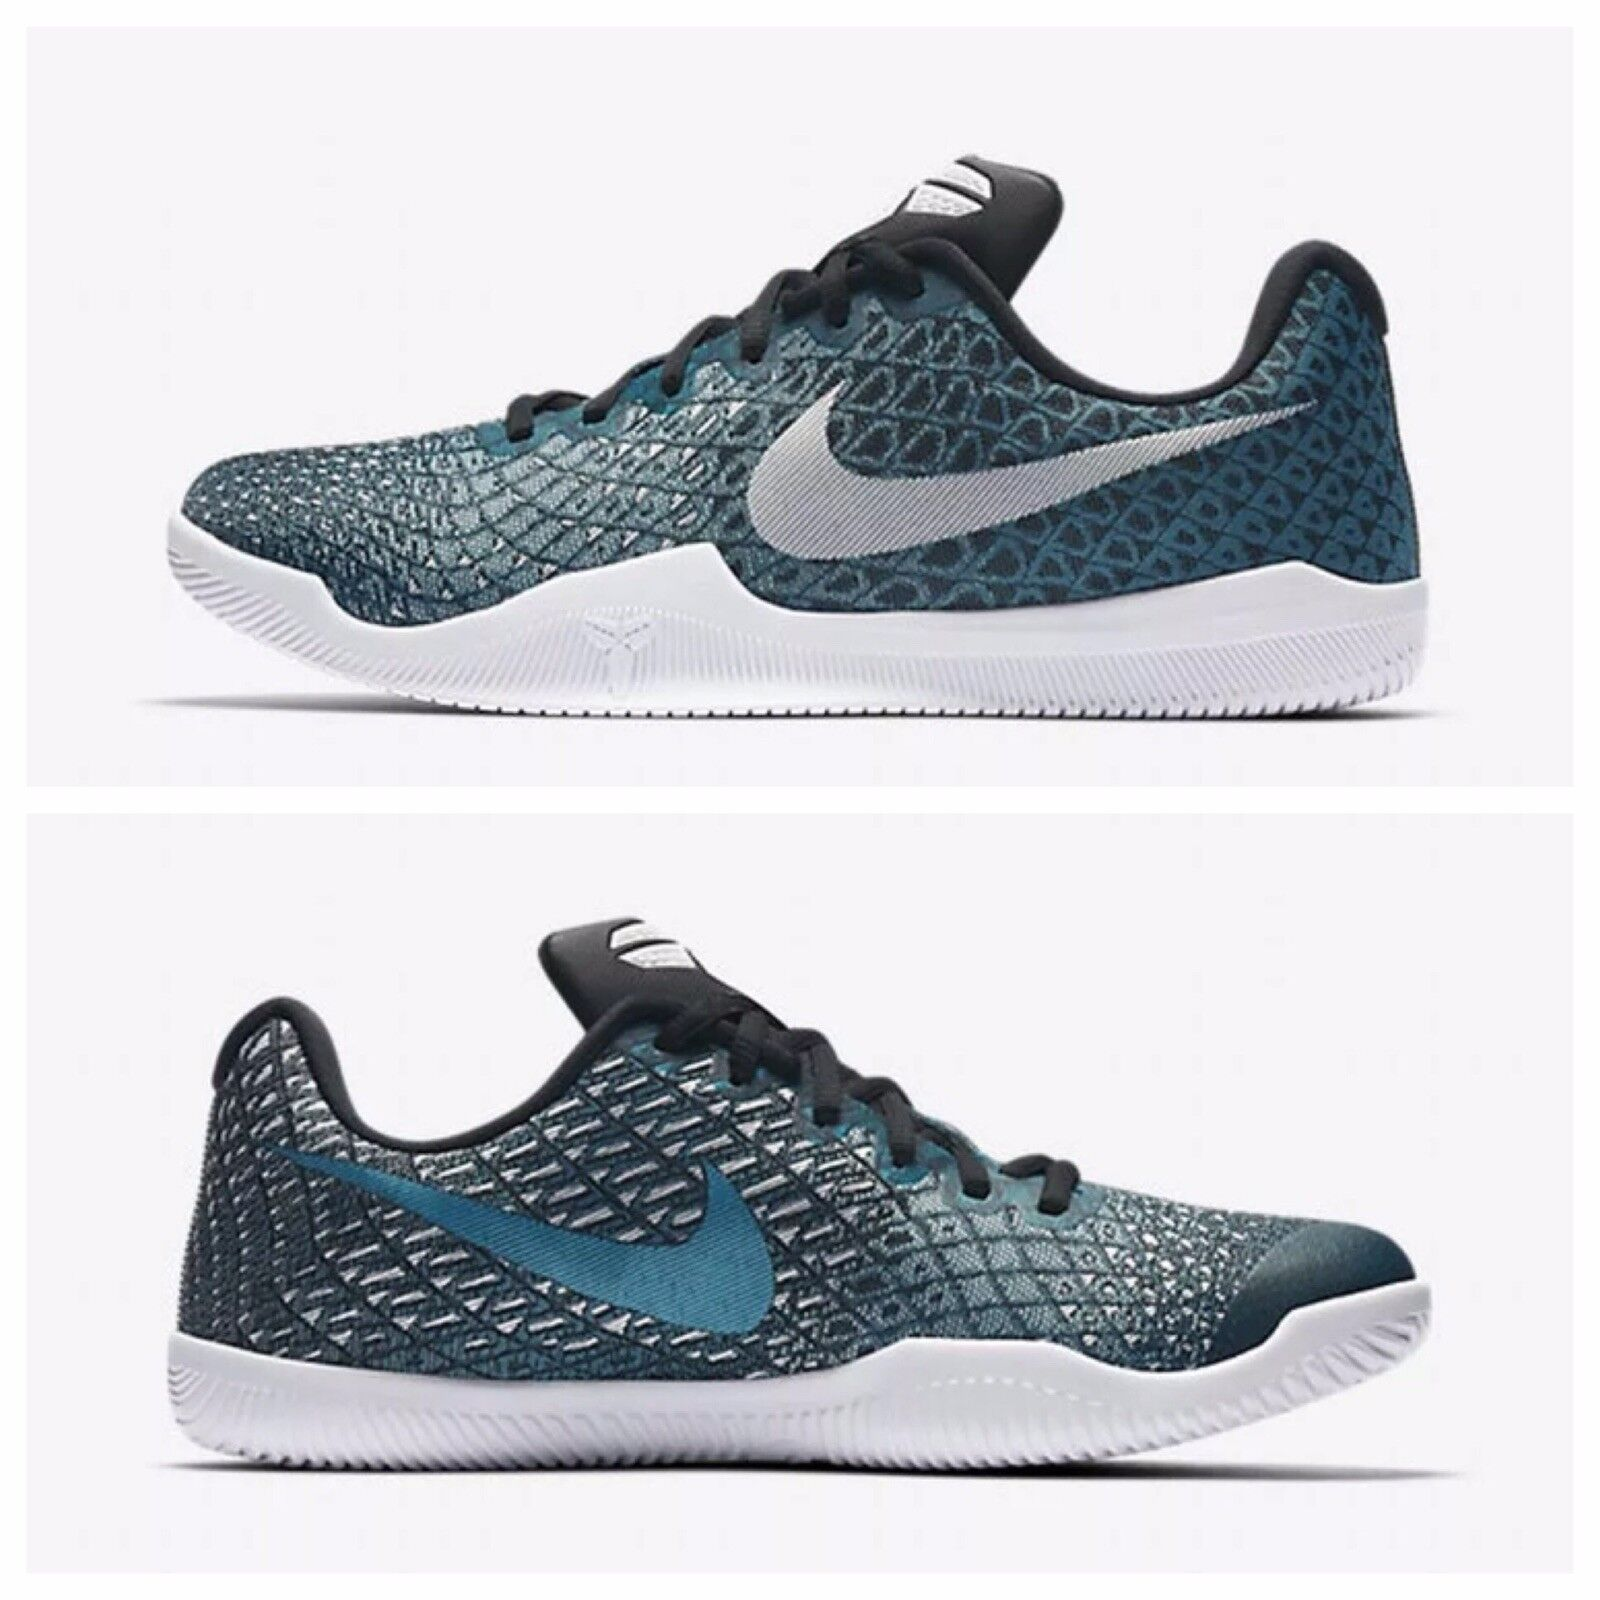 Nike KOBE Mamba Instinct Pure Platinum Basketball Shoes (852473 300) - Size 10